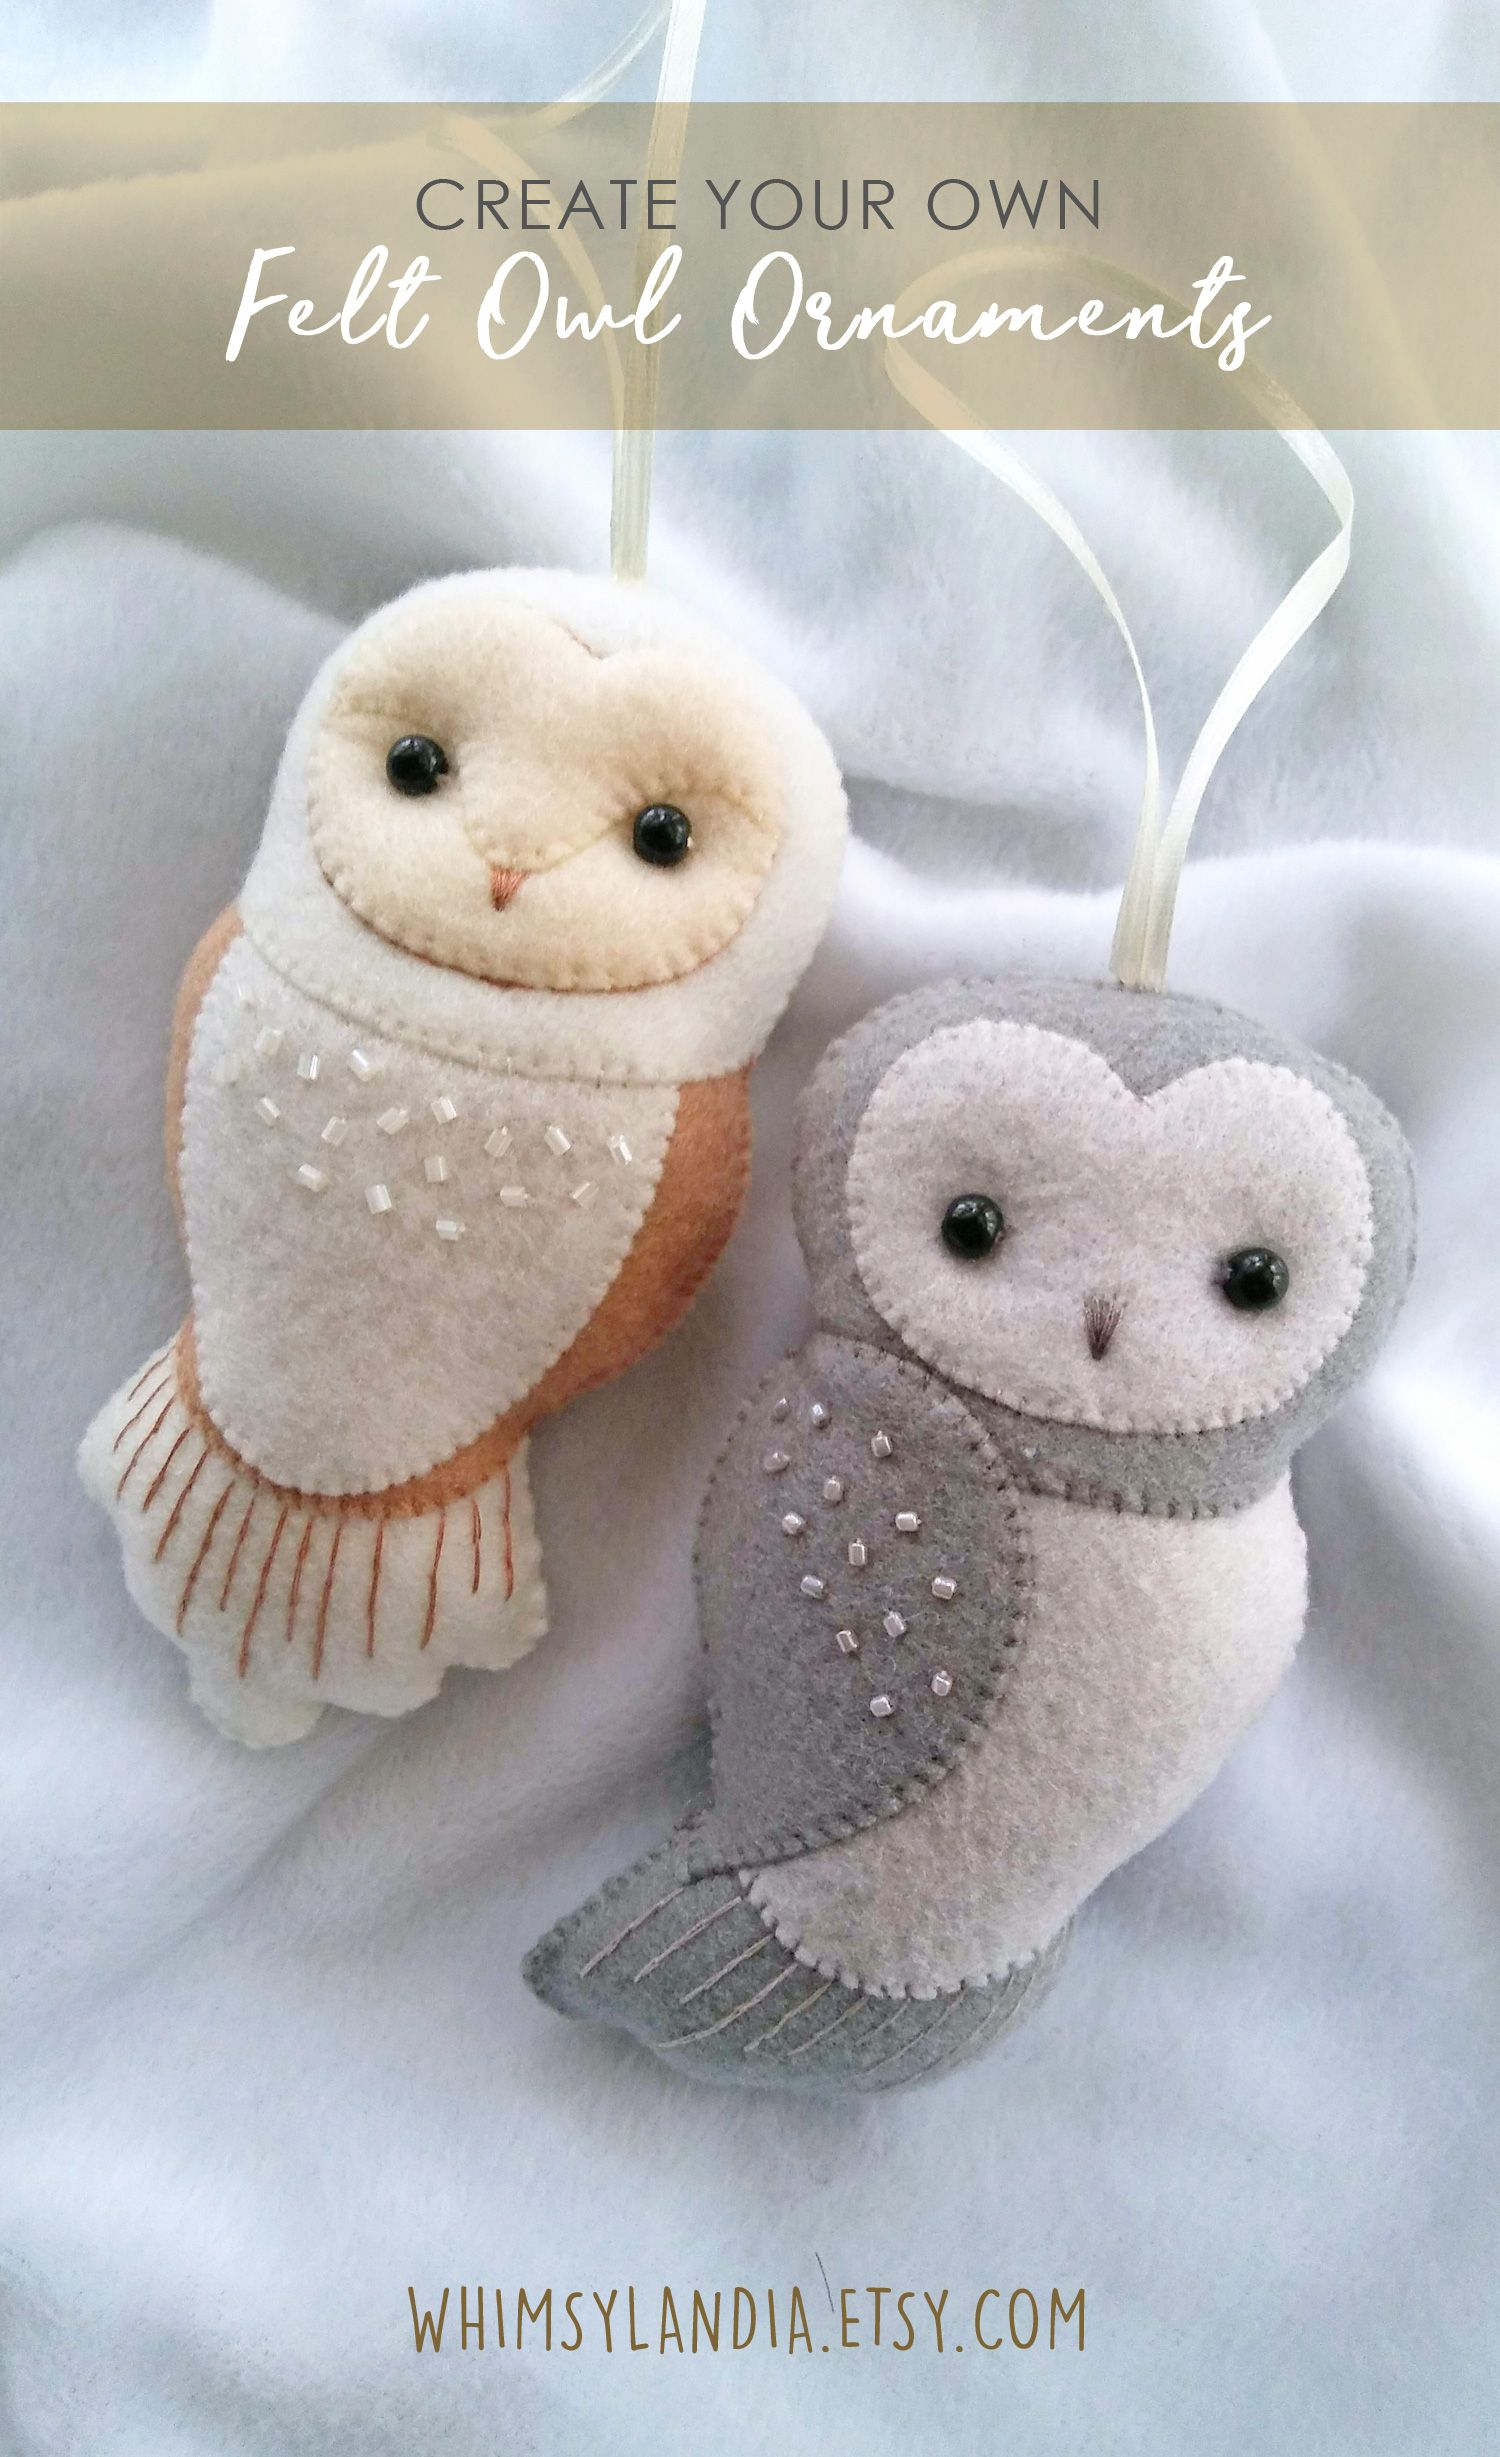 New Set Of Two Felt Owl Ornaments Pdf Patterns And Tutorial Etsy Felt Owls Felt Ornaments Felt Crafts